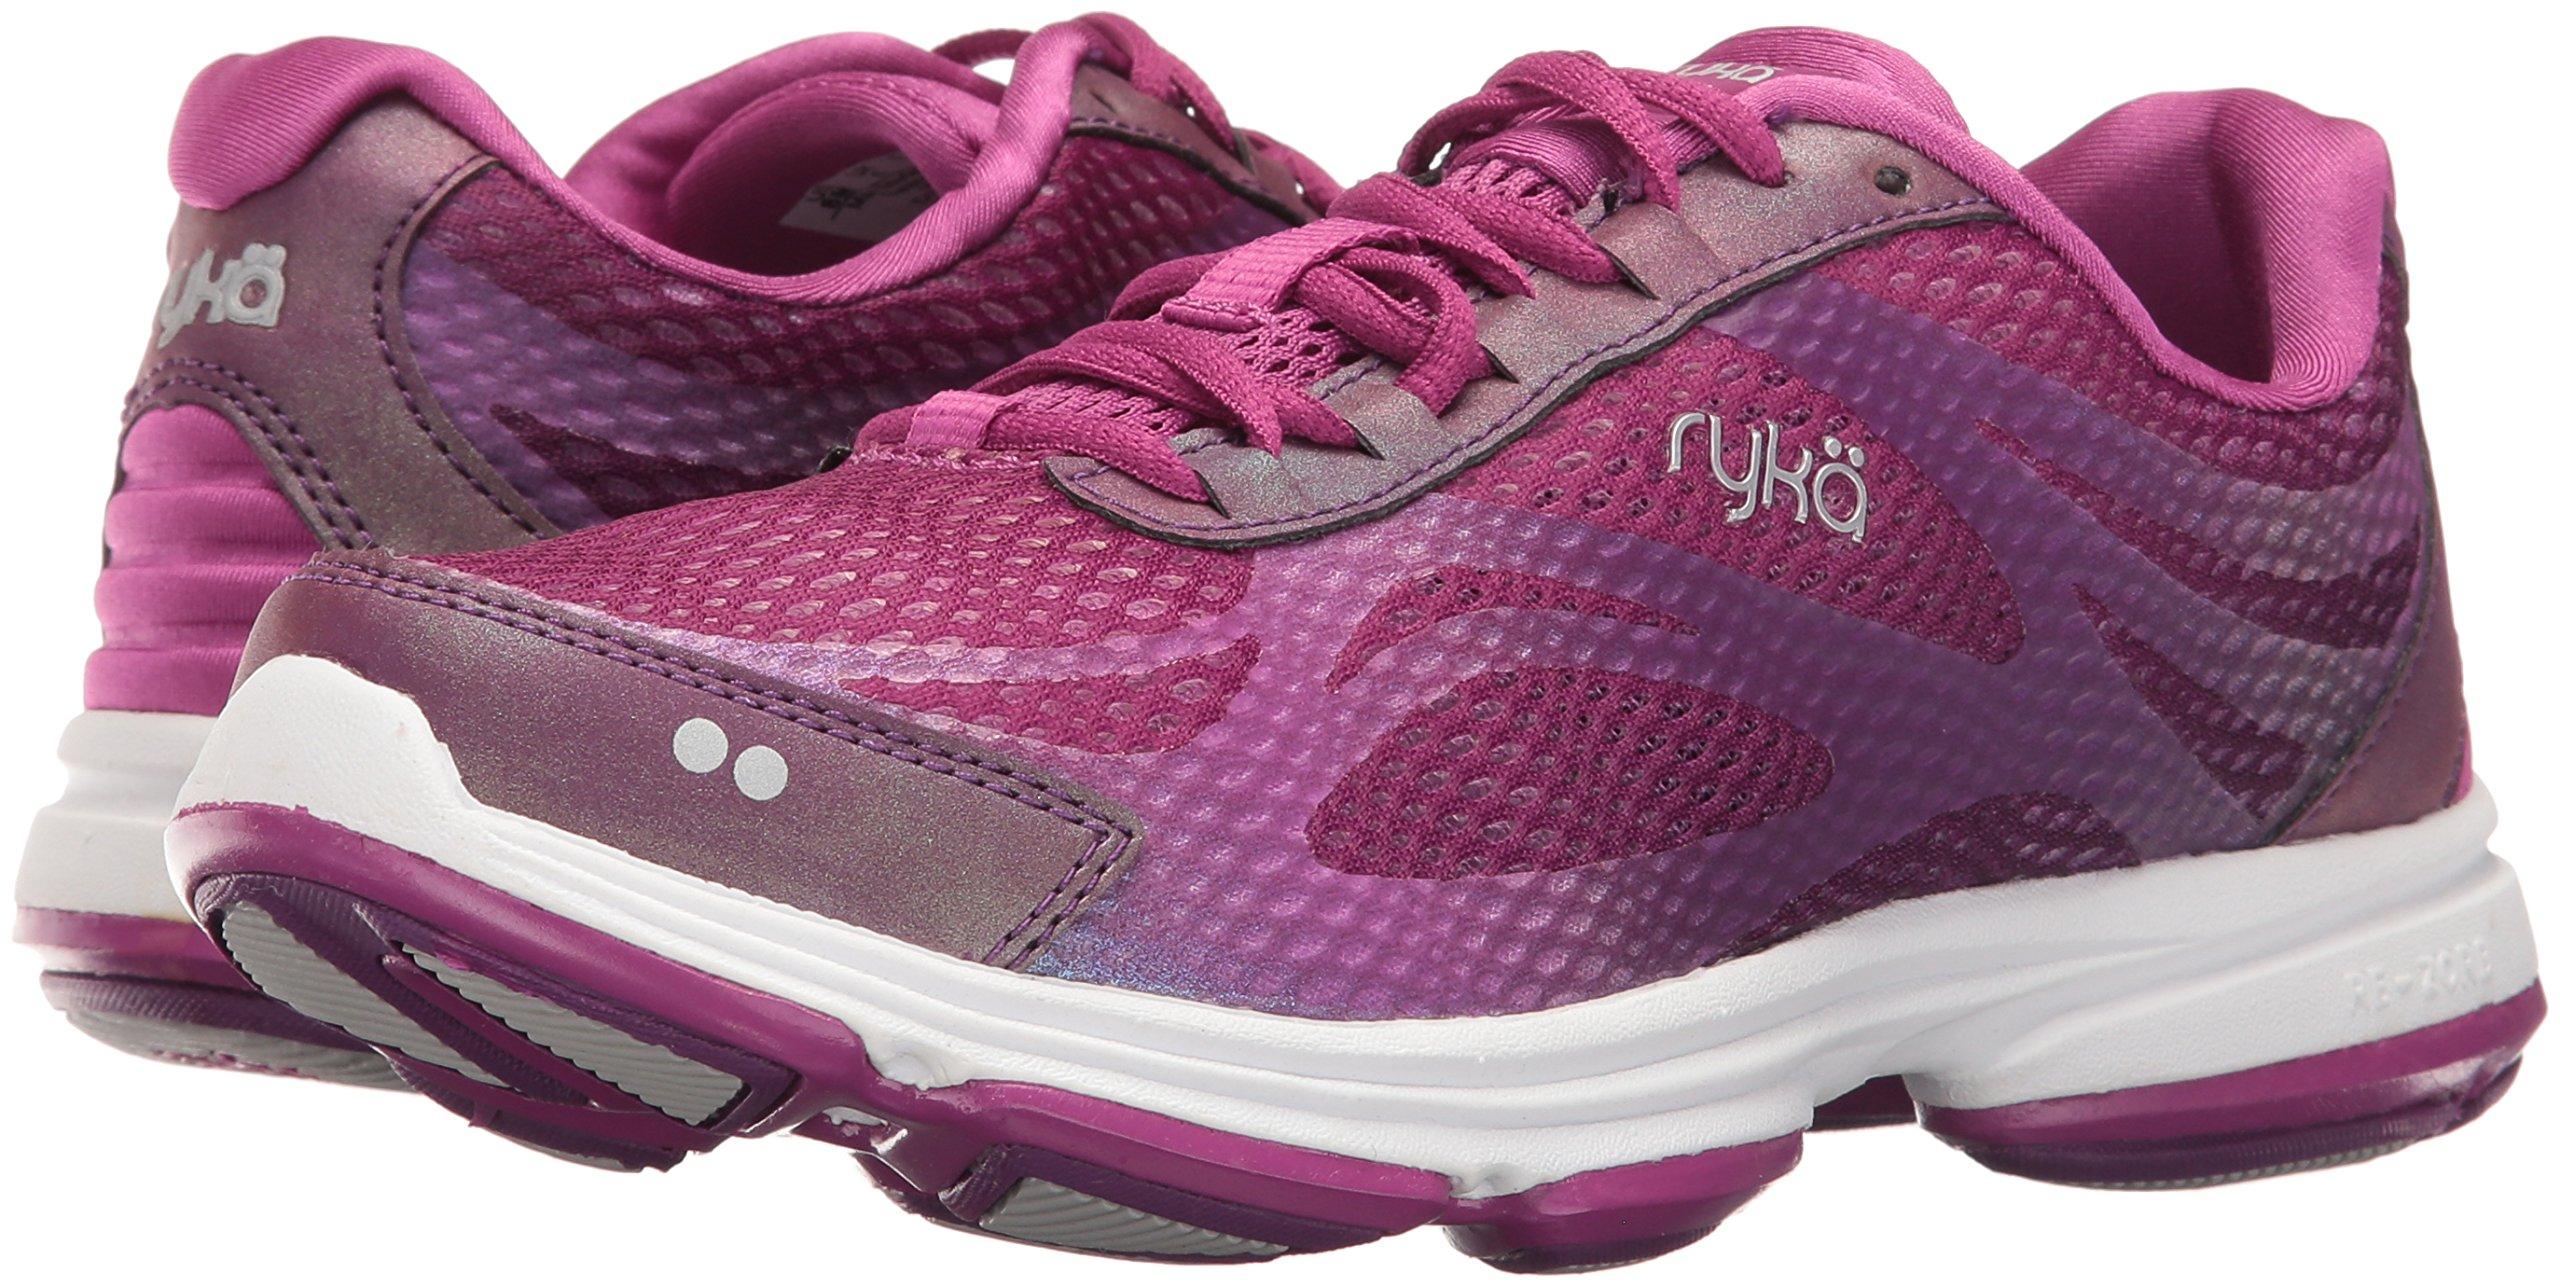 Ryka Women's Devotion Plus 2 Cross Trainer,Grape Juice/Vivid Berry/Chrome Silver by Ryka (Image #6)